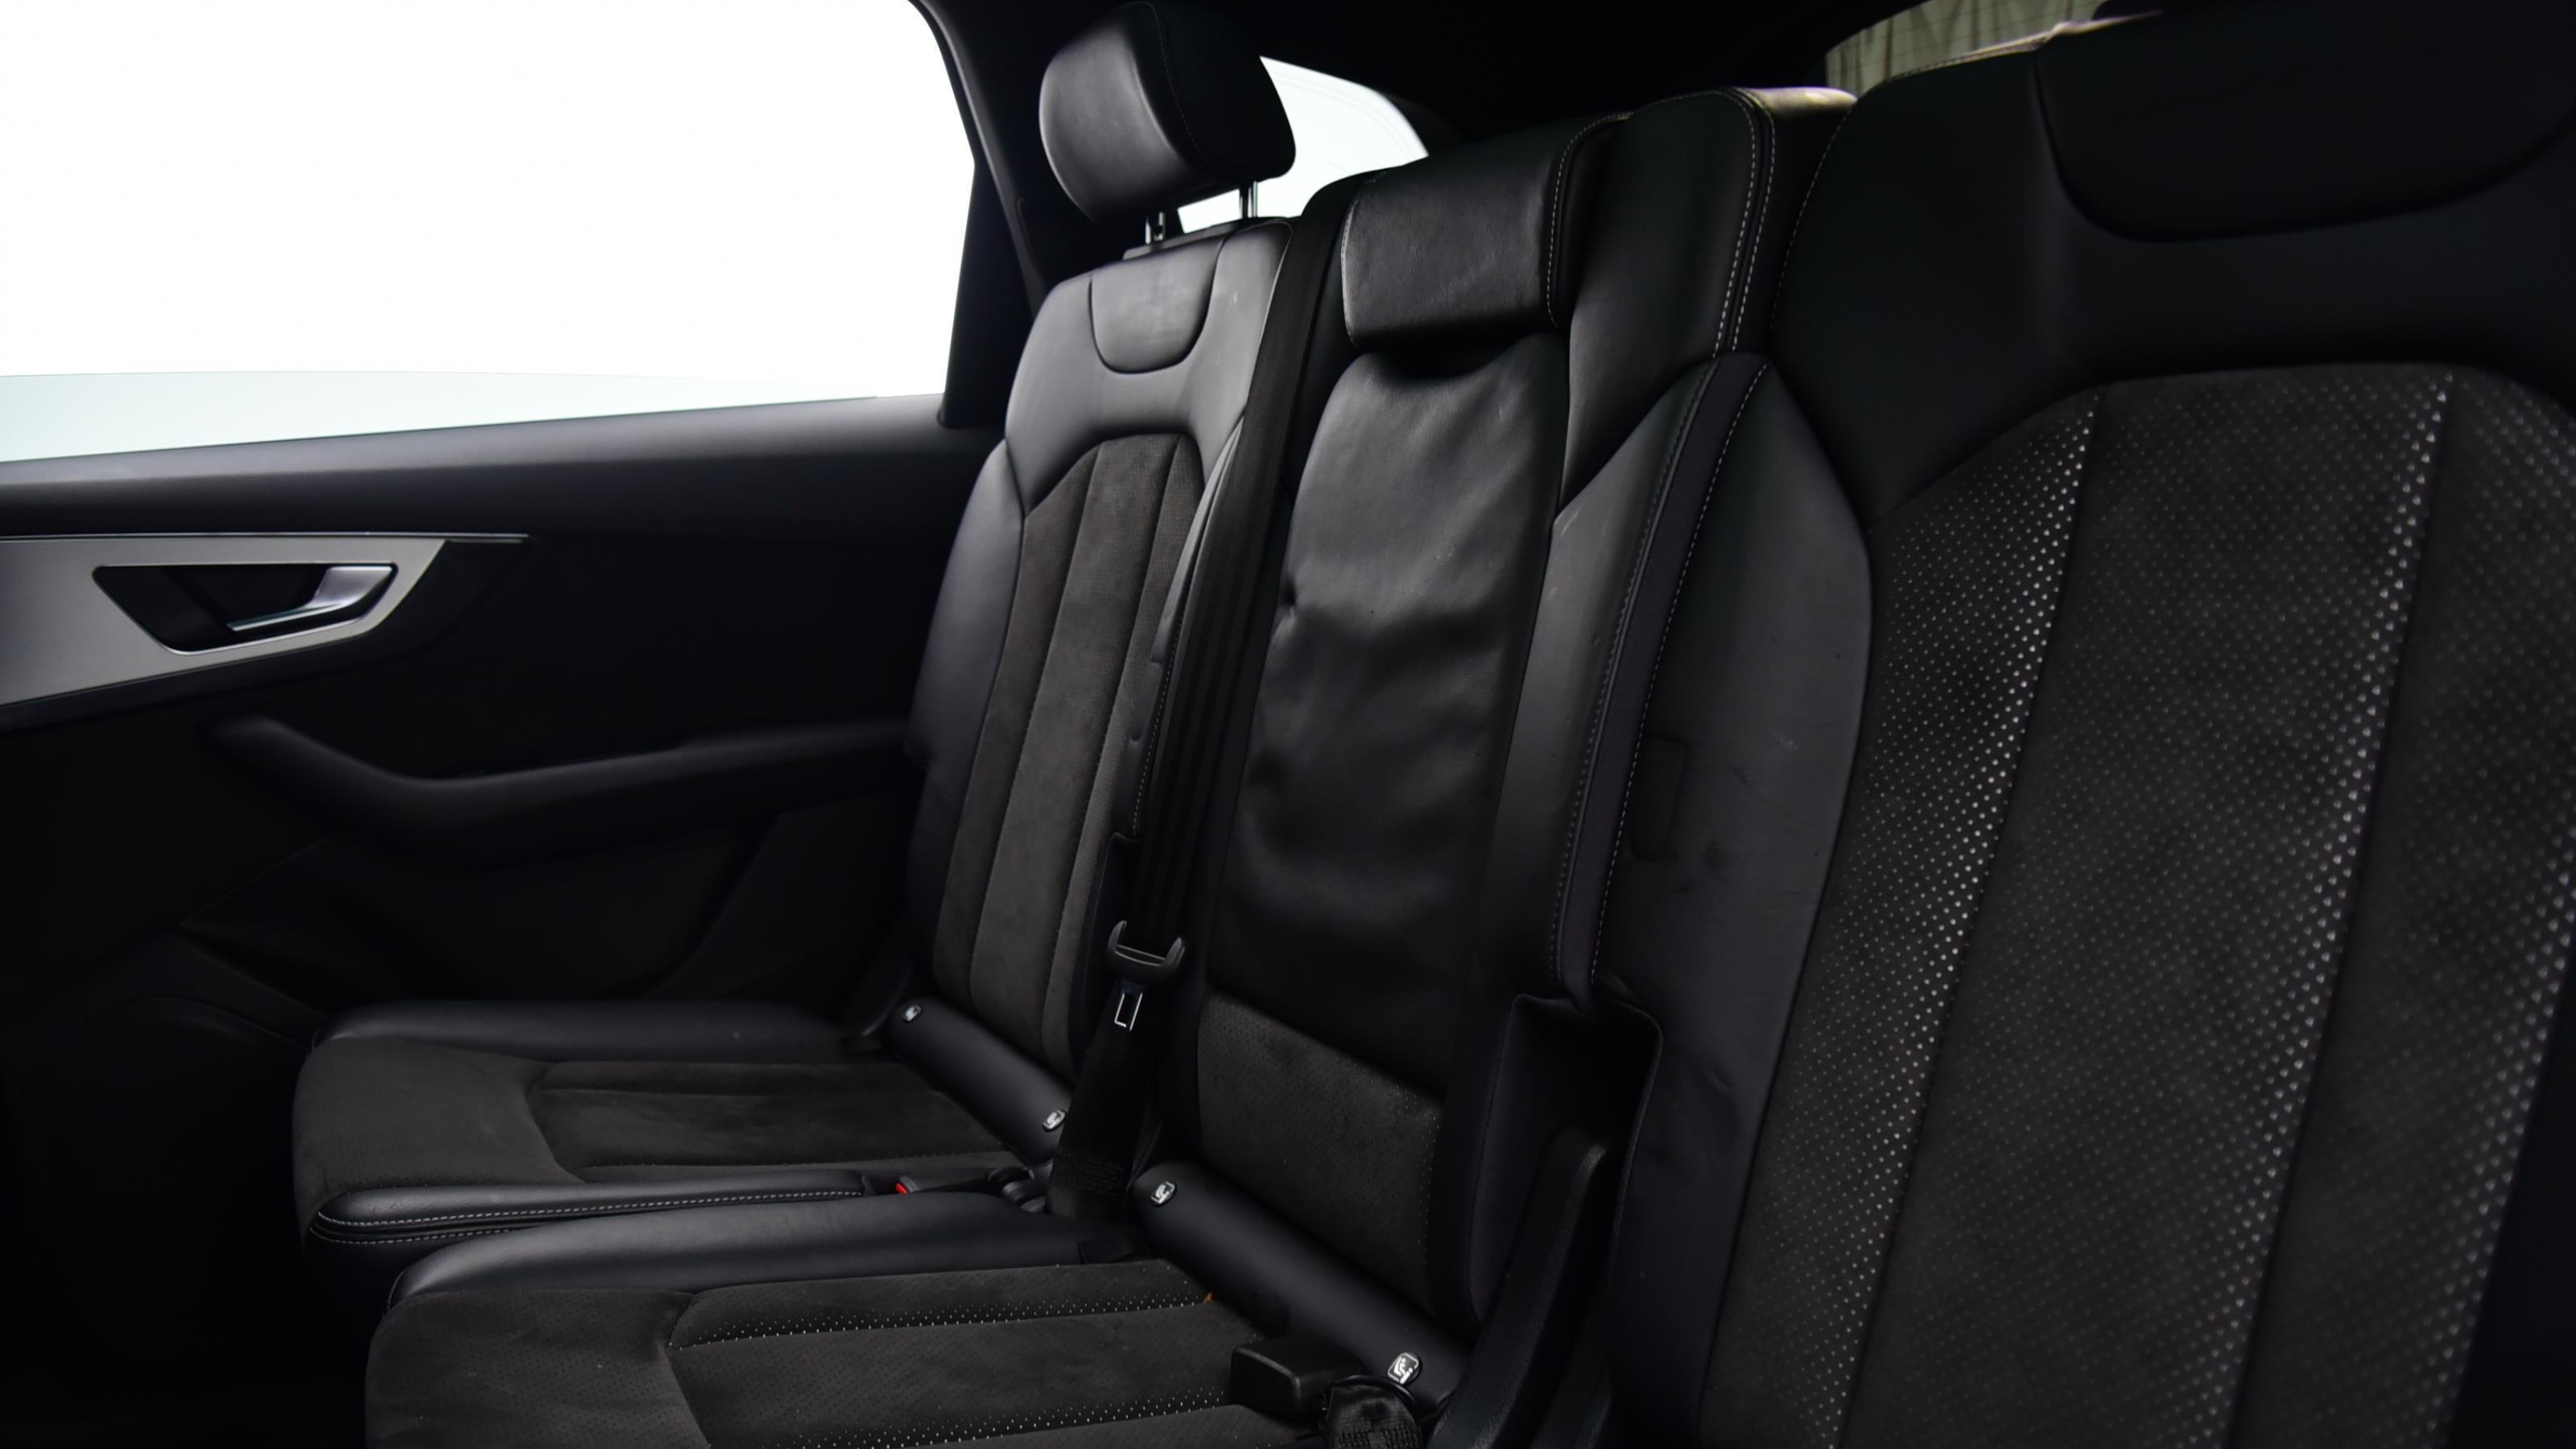 Used 2016 Audi Q7 3.0 TDI Quattro S Line 5dr Tip Auto WHITE at Saxton4x4